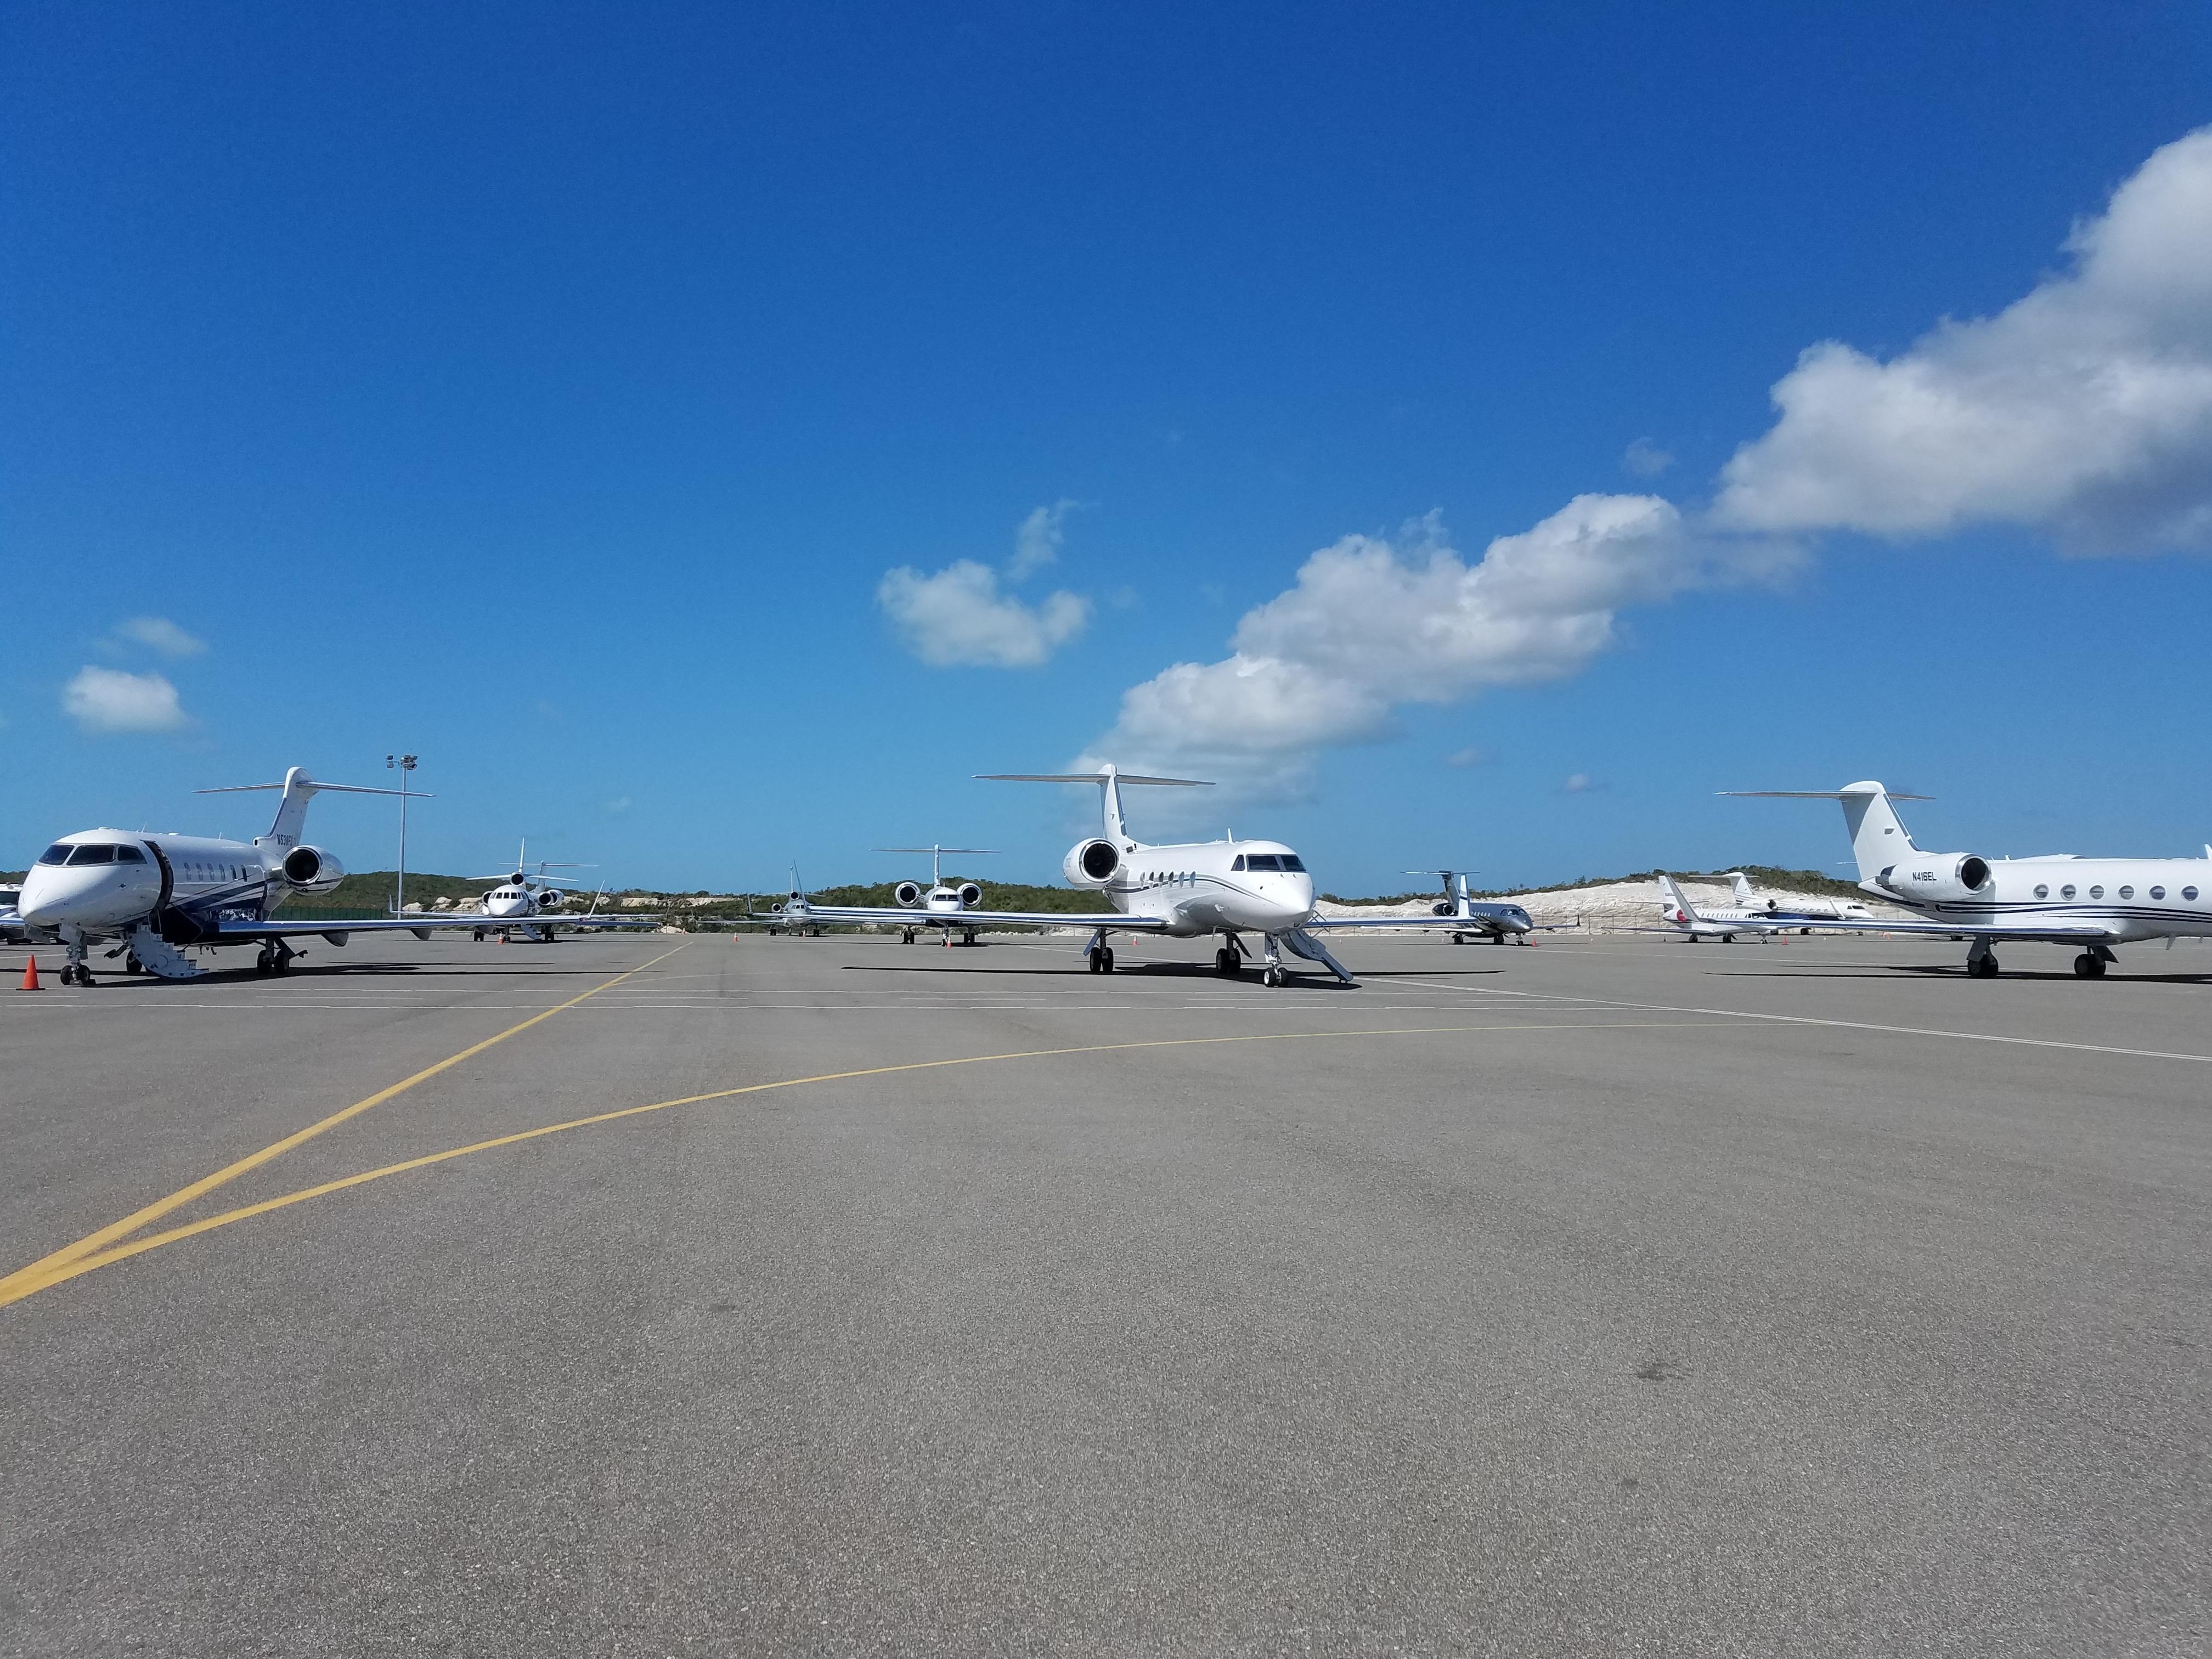 Blue Heron Aviation - PROVIDENCIALES INTL, TC, MBPV